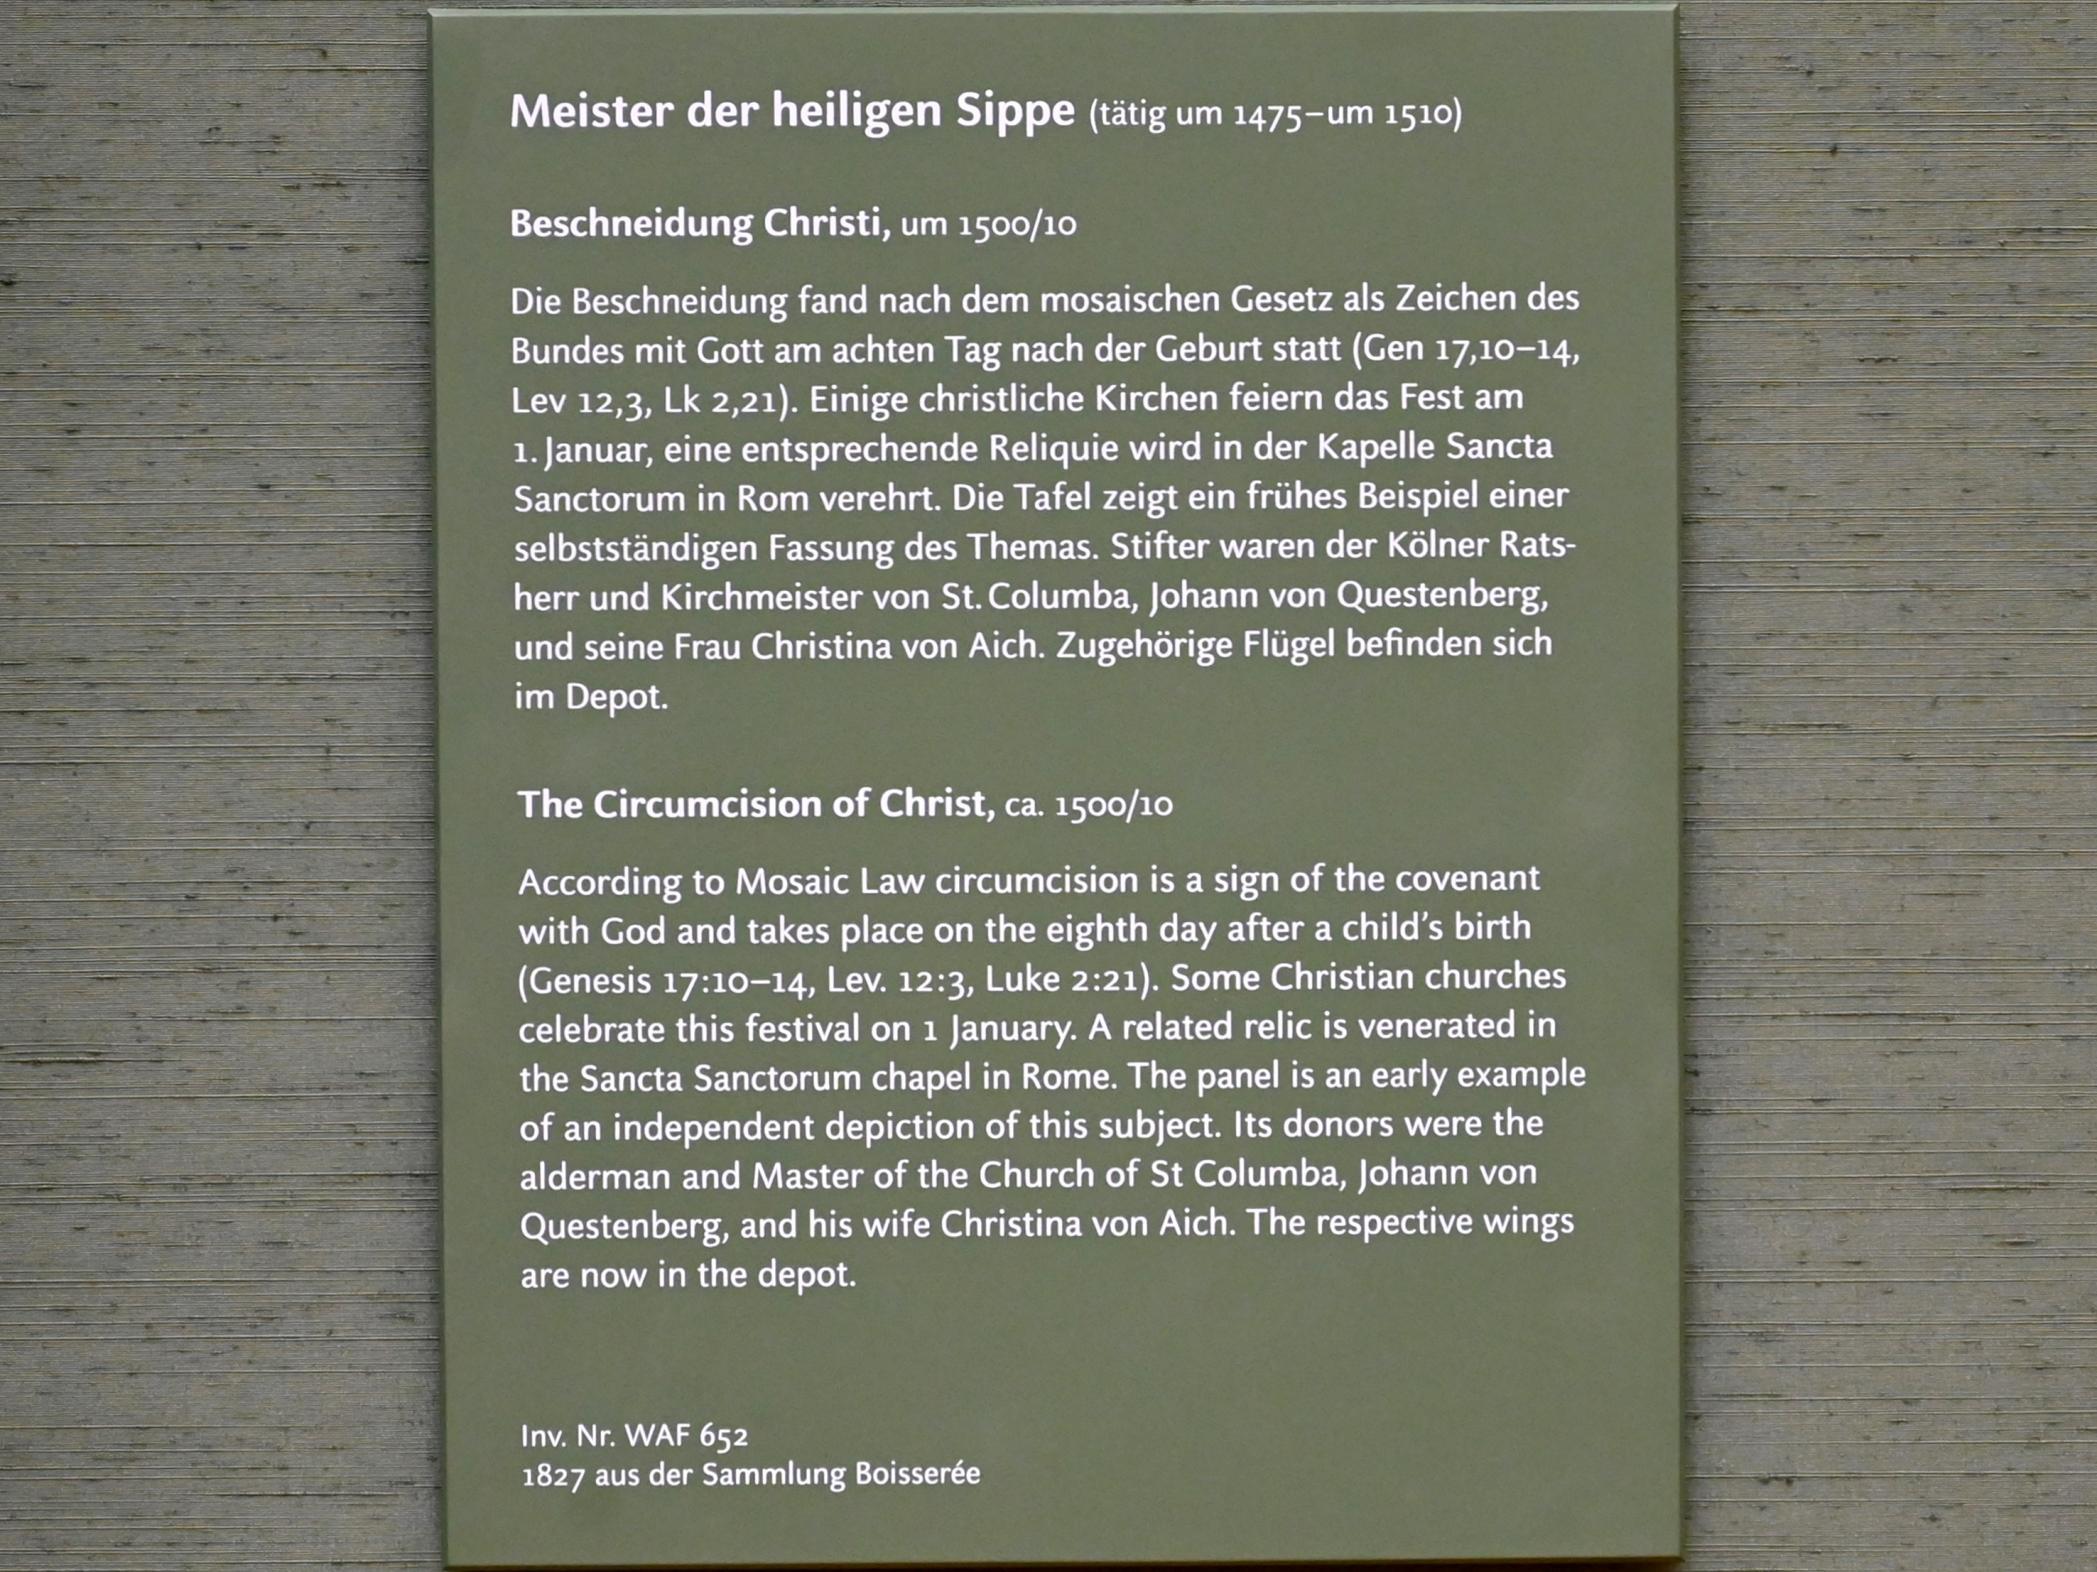 Meister der heiligen Sippe: Beschneidung Christi, Um 1500 - 1510